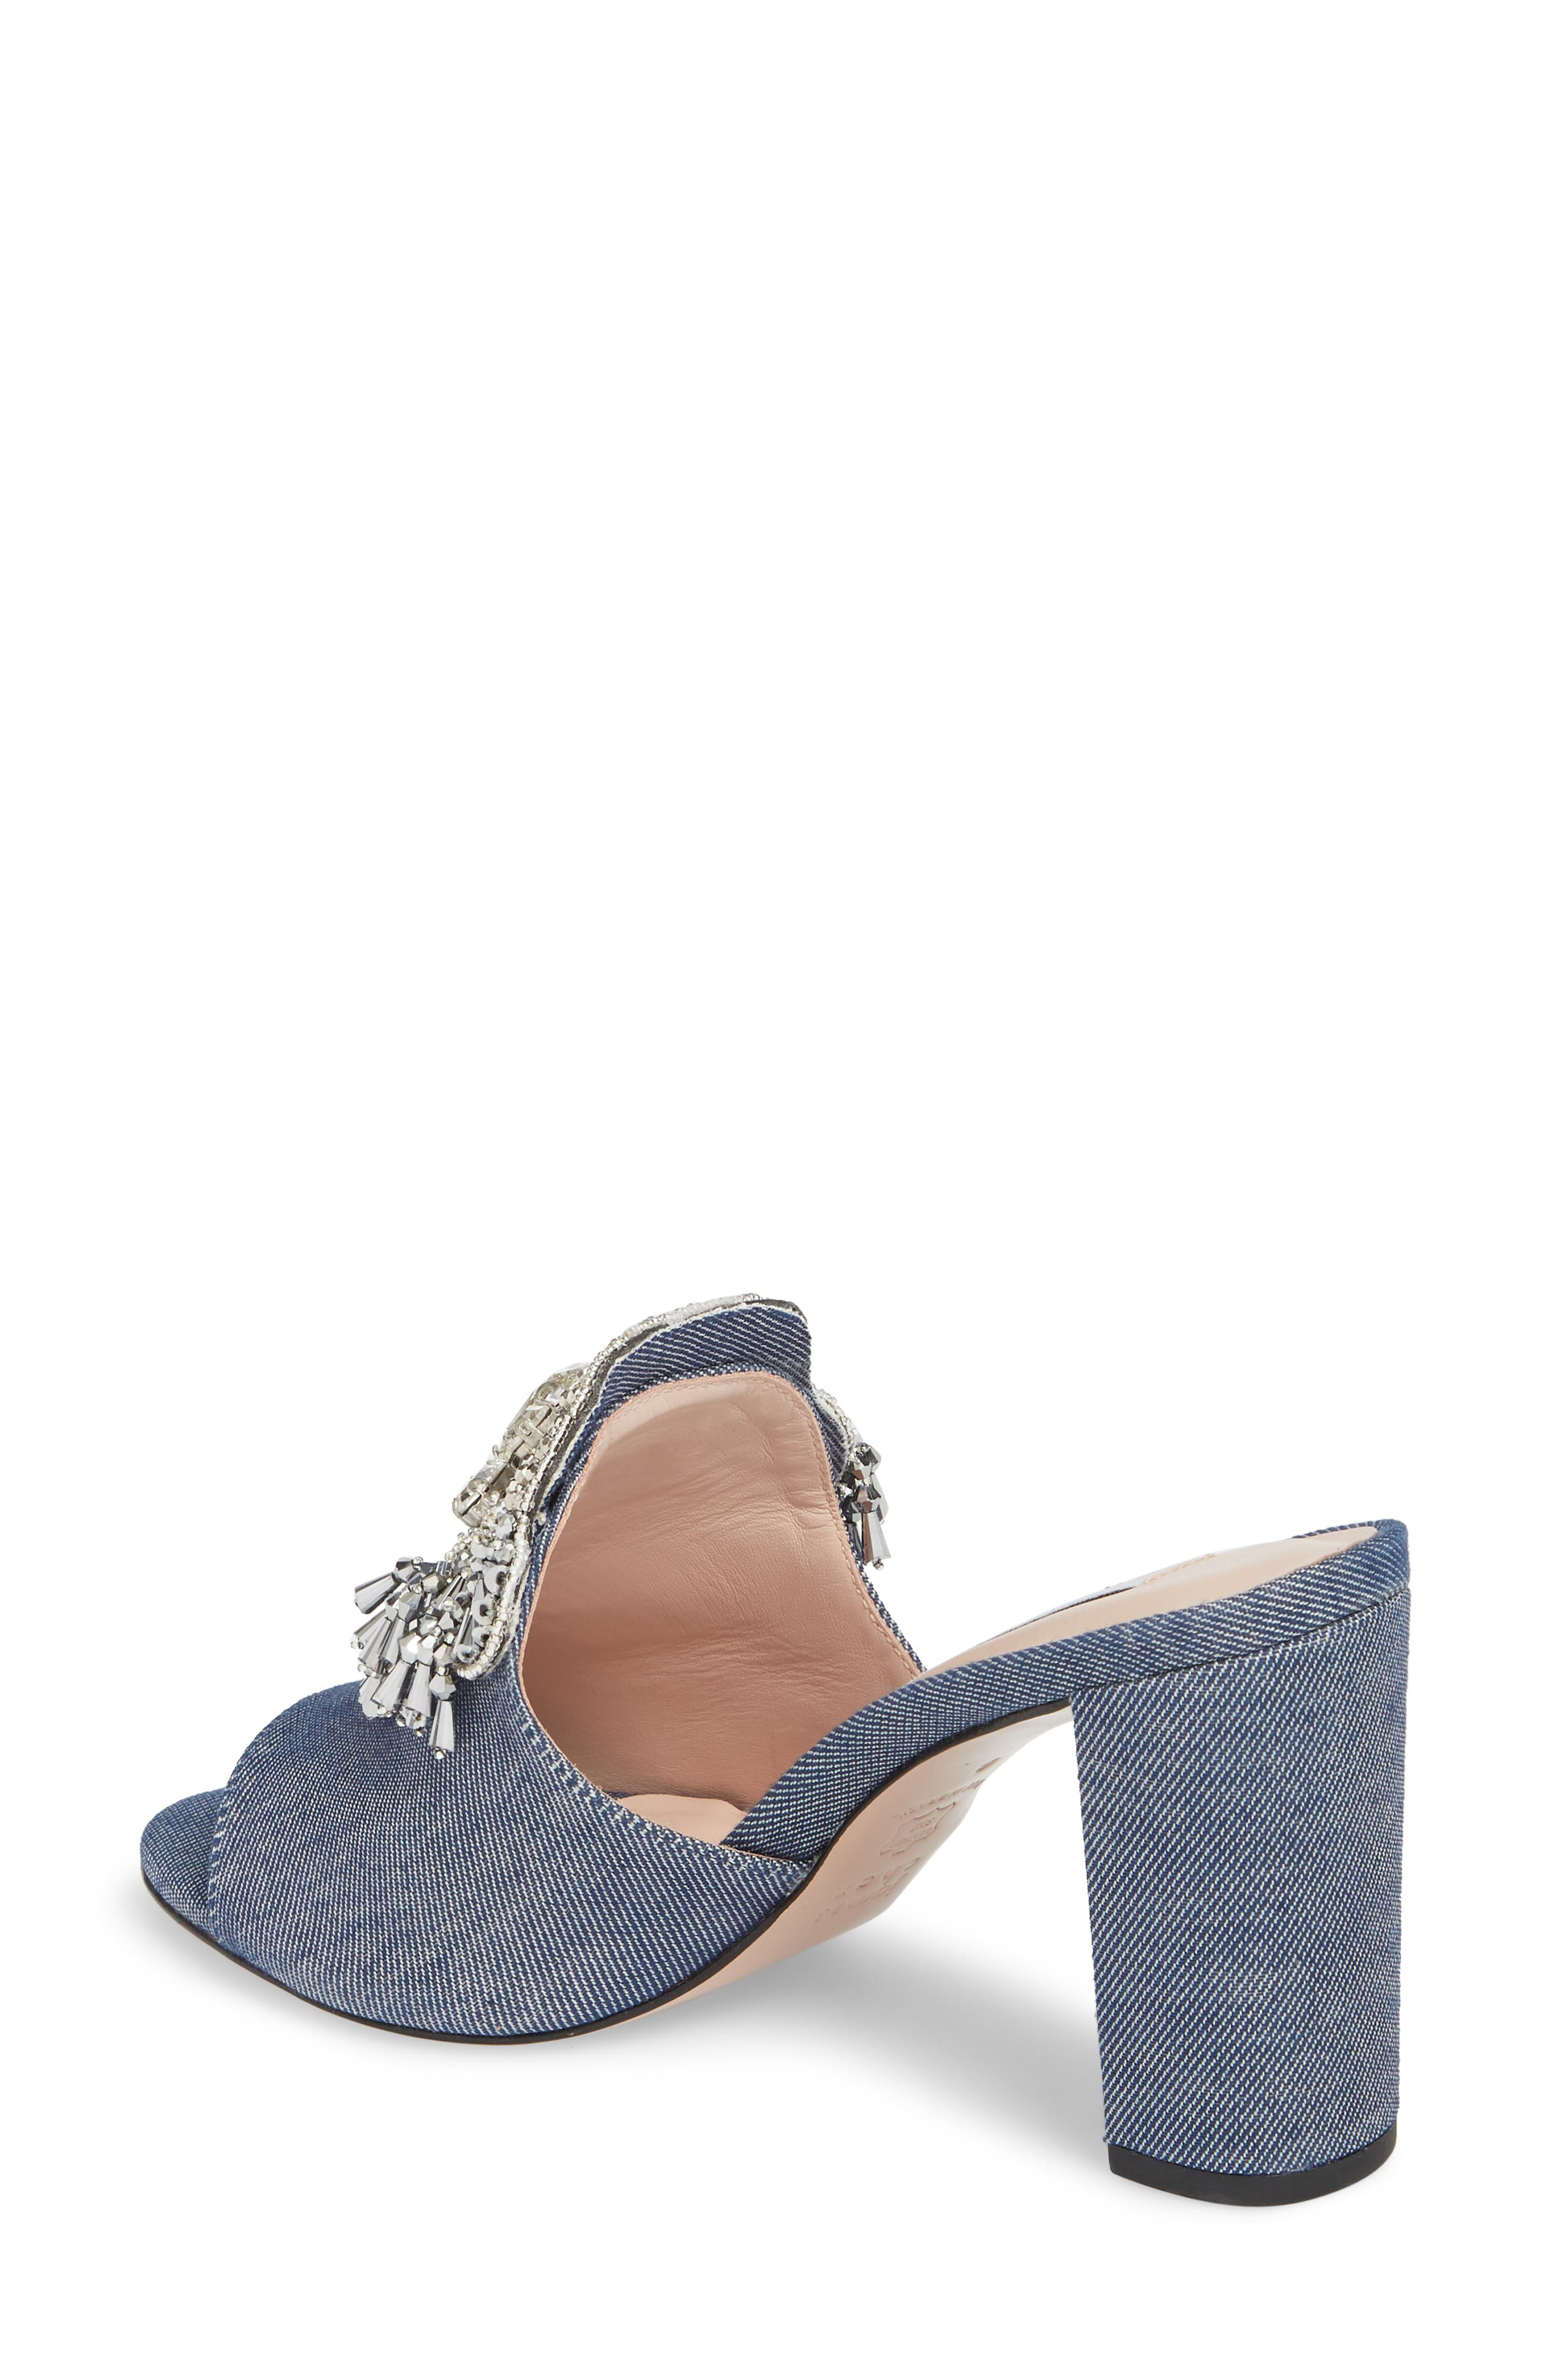 Adele Embellished Block Heel Sandal,                             Alternate thumbnail 2, color,                             Denim Patent